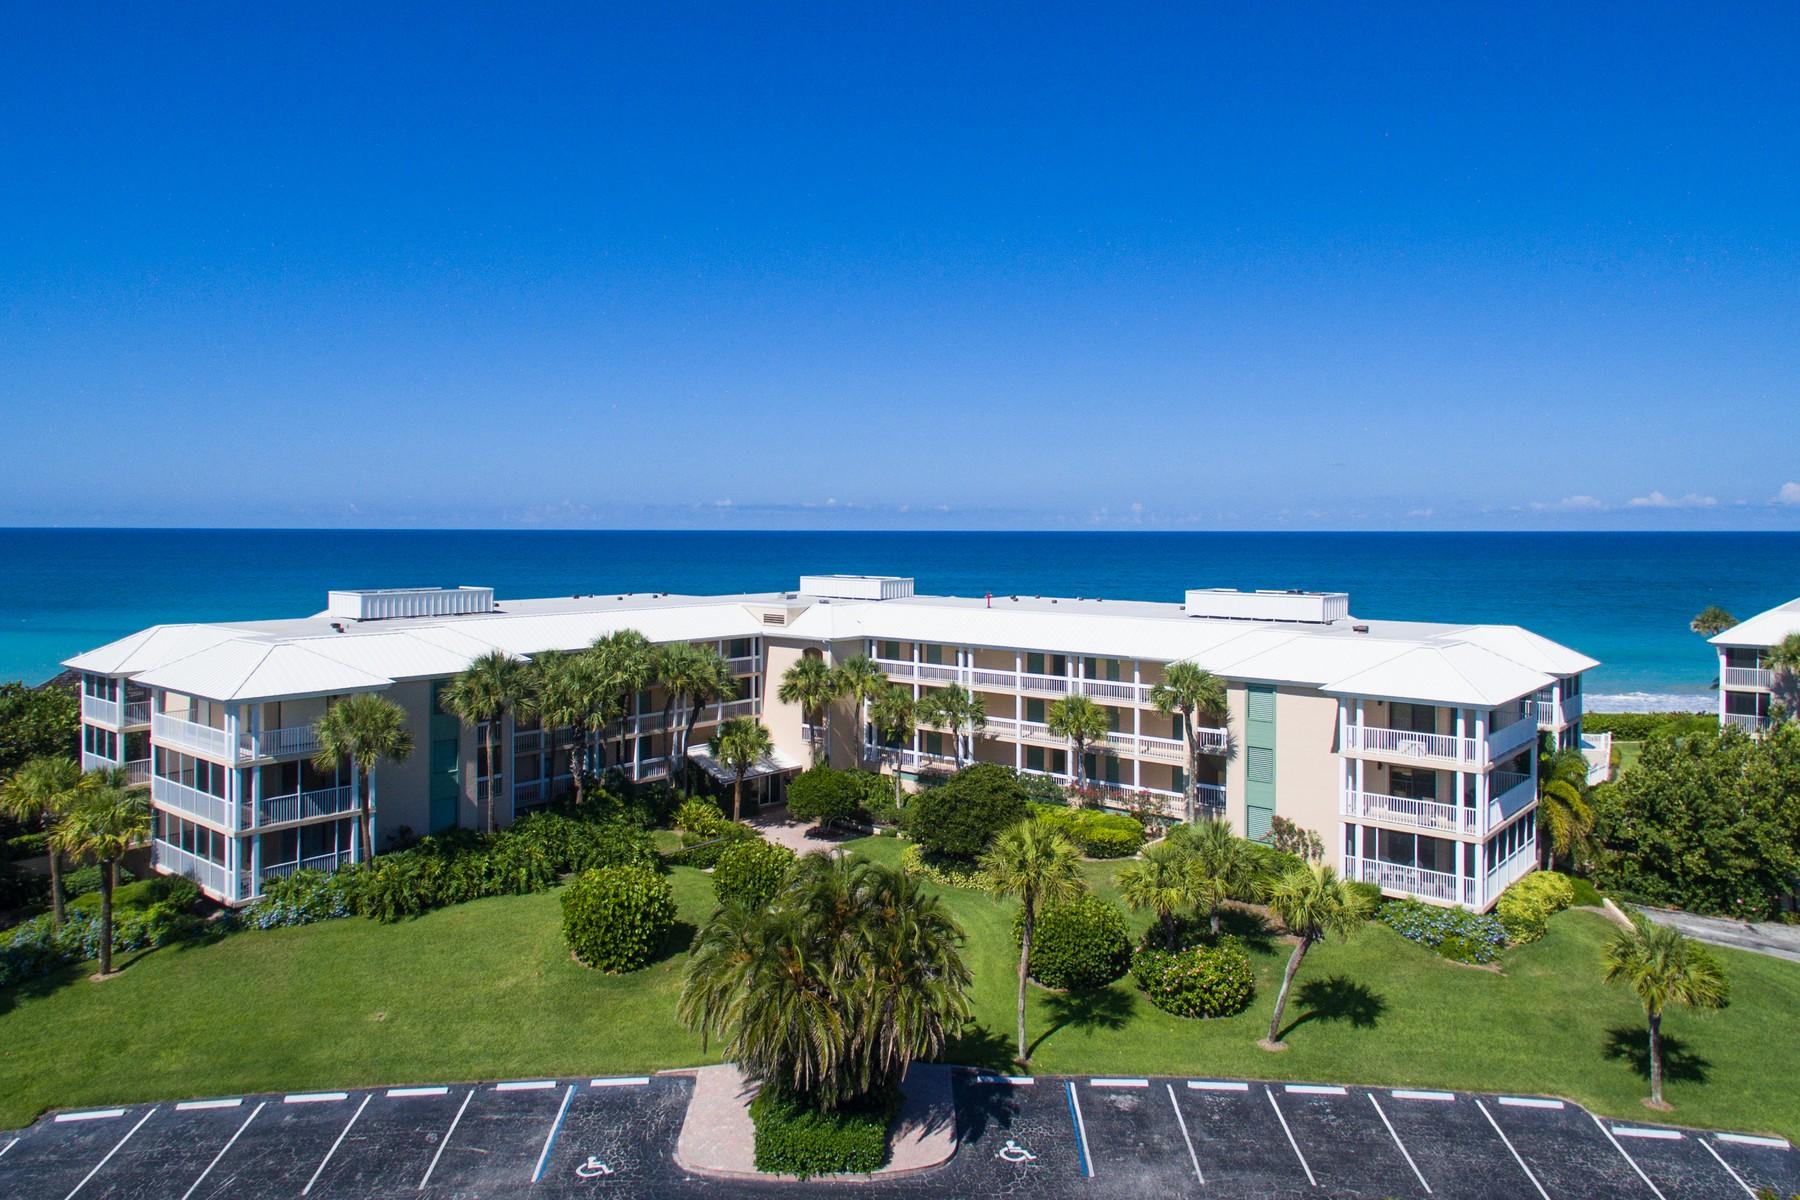 Condominium for Sale at Lovely Sea Oaks Oceanfront Condo 8840 S Sea Oaks Way #108B Vero Beach, Florida, 32963 United States